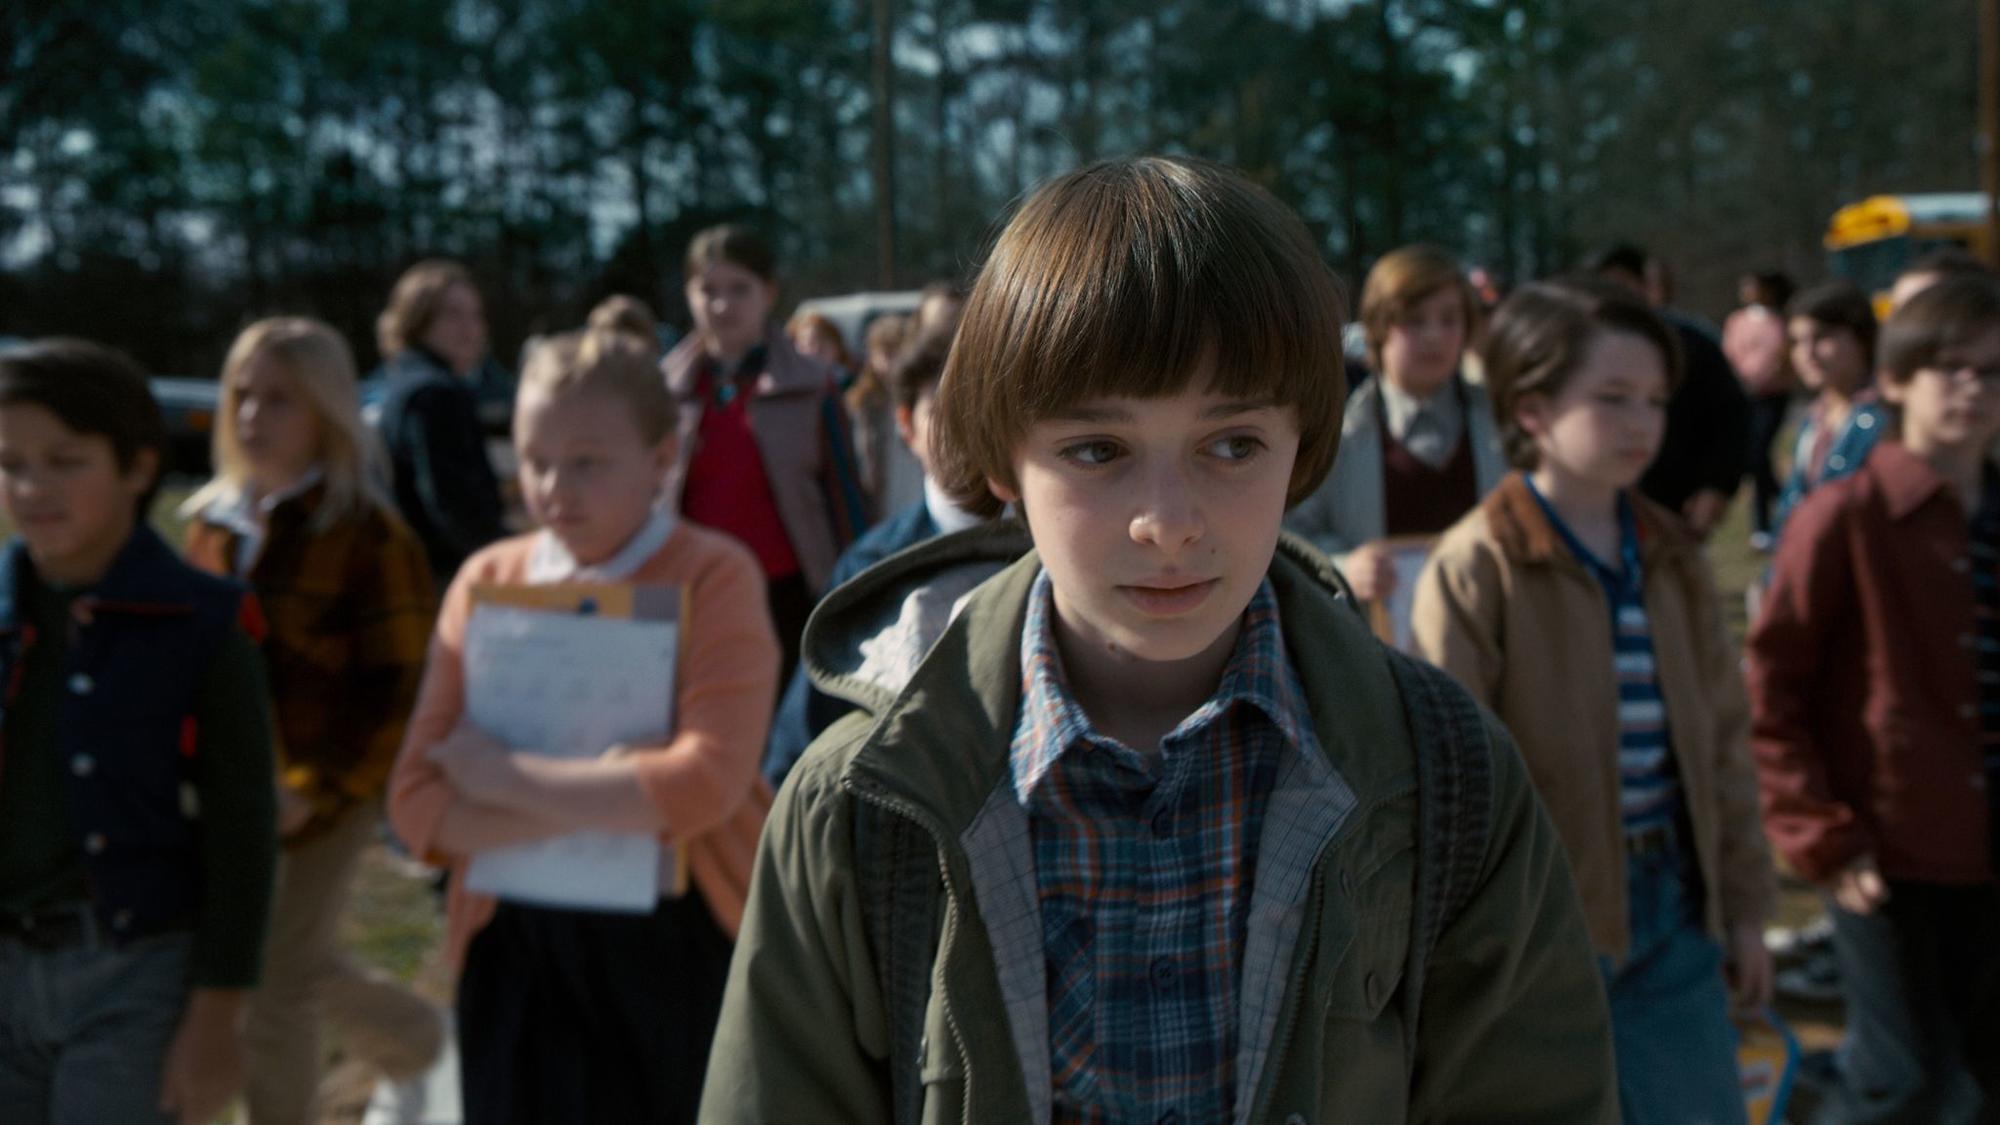 Stranger Things' Season 2 premiere recap: Back to the Upside Down